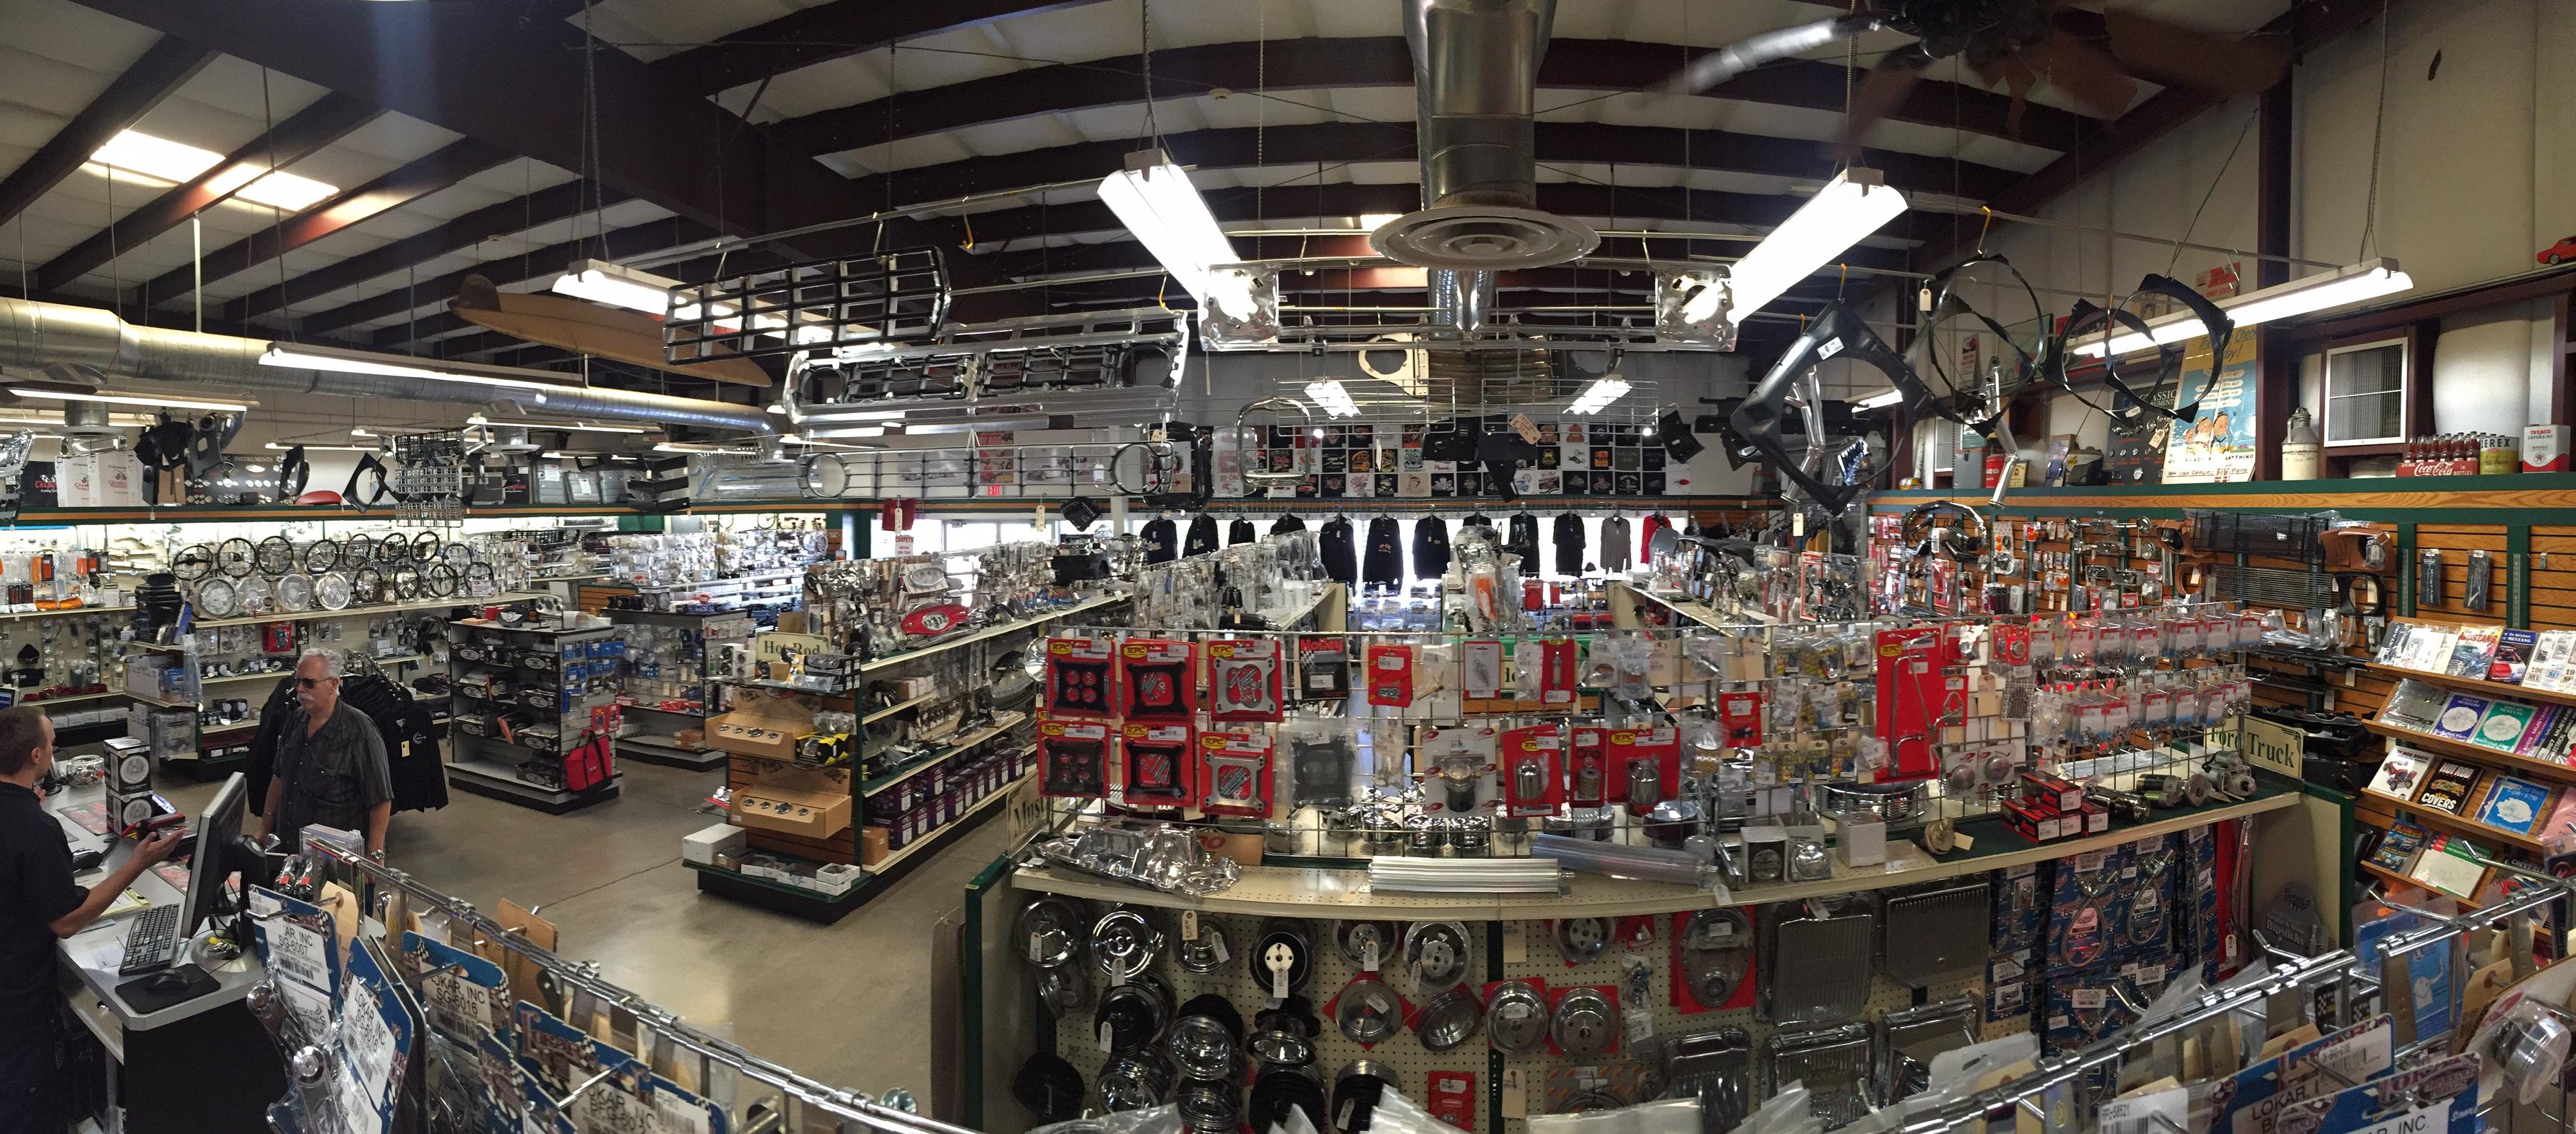 2-so-cal-speed-shop-arizona-inside-store-parts.jpg